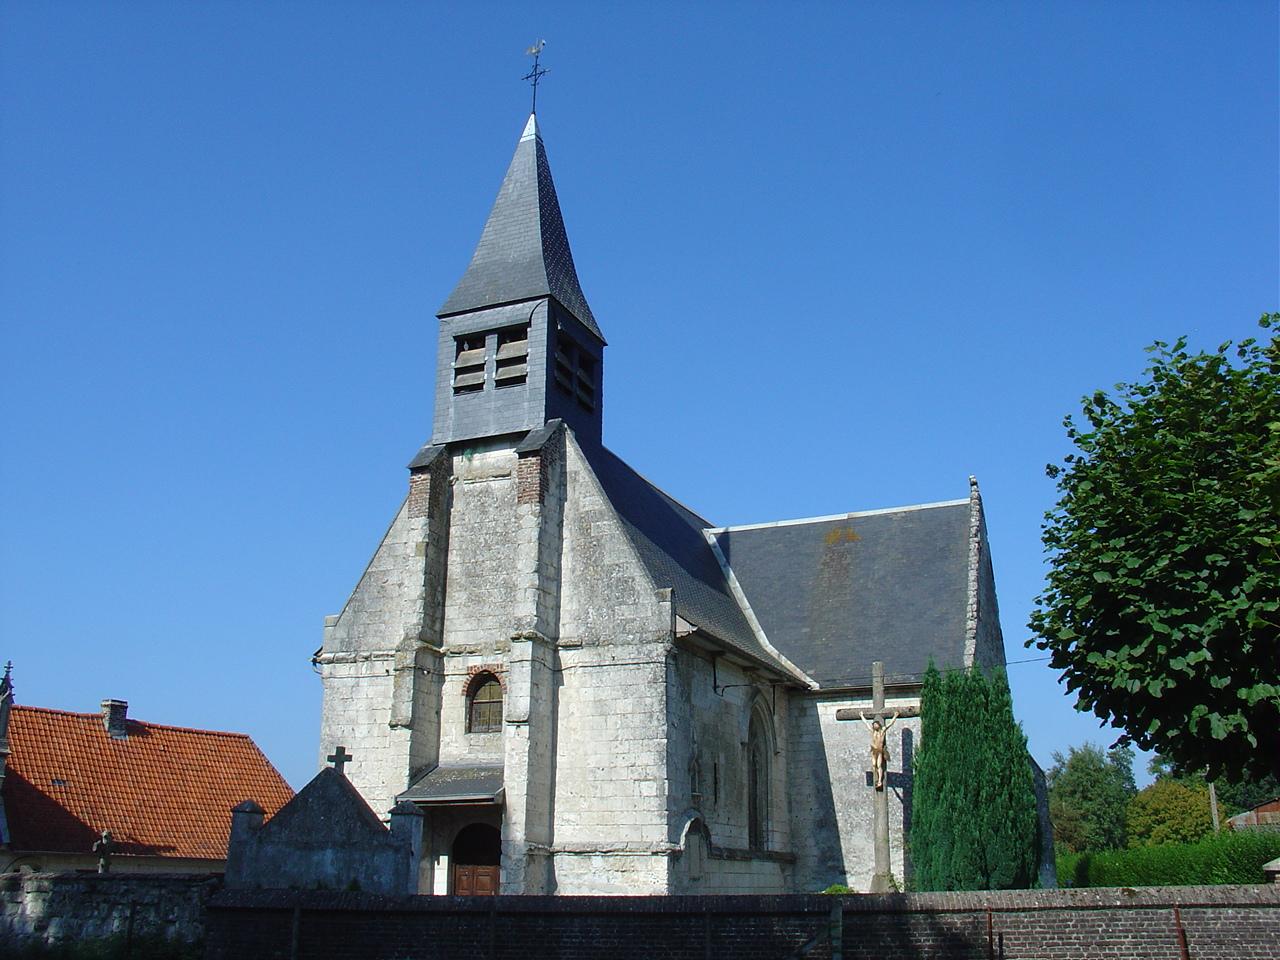 Conteville-en-Ternois